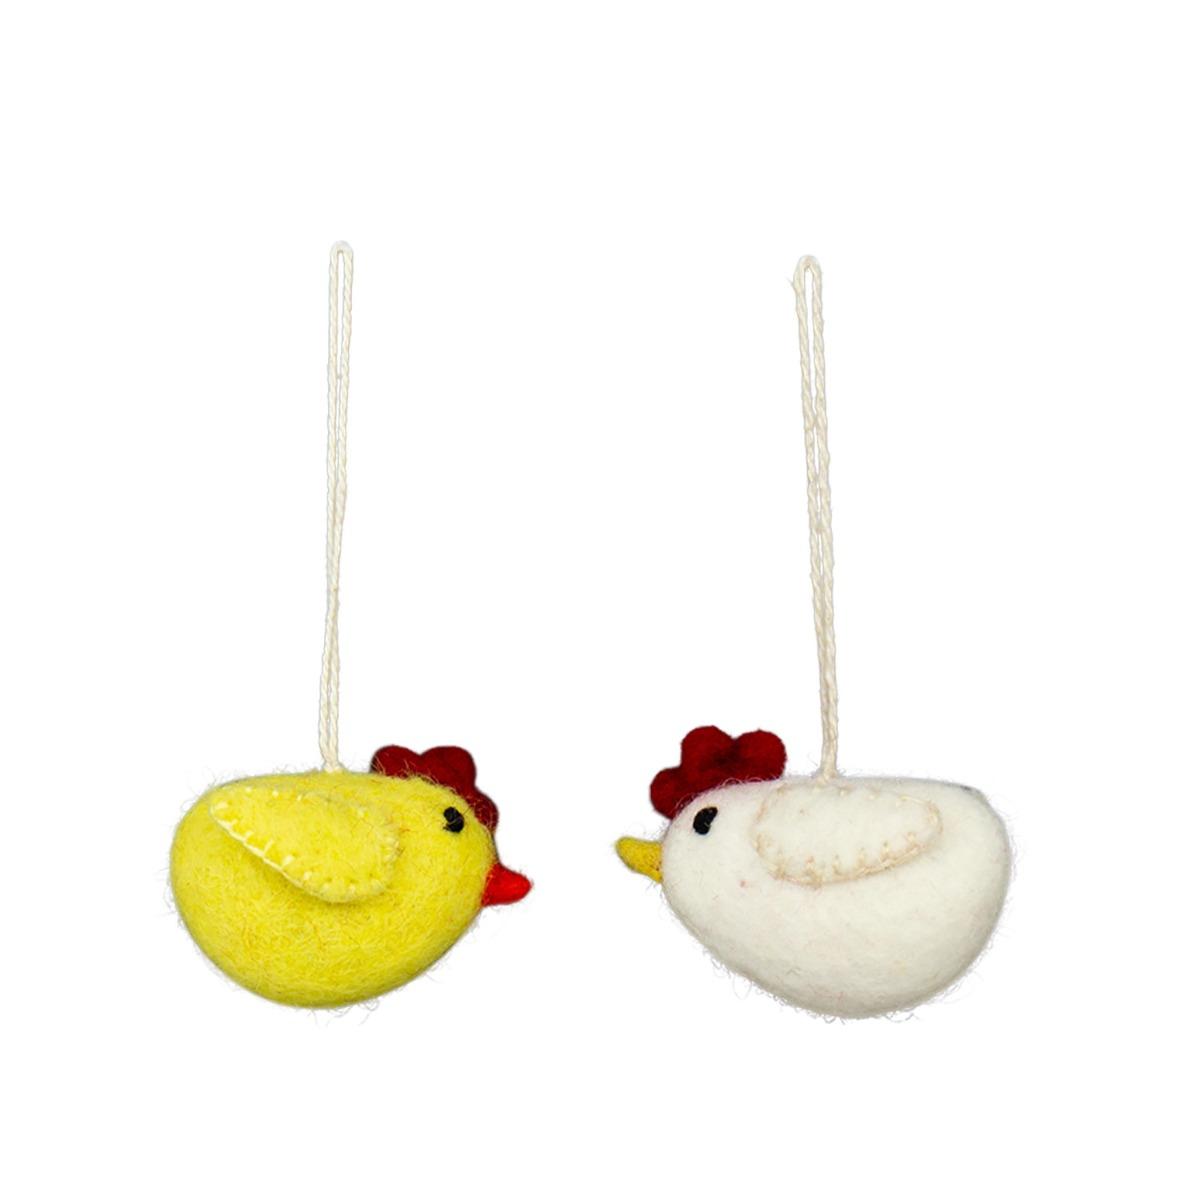 Designtorget Påskhänge Kyckling 2-p gul/vit